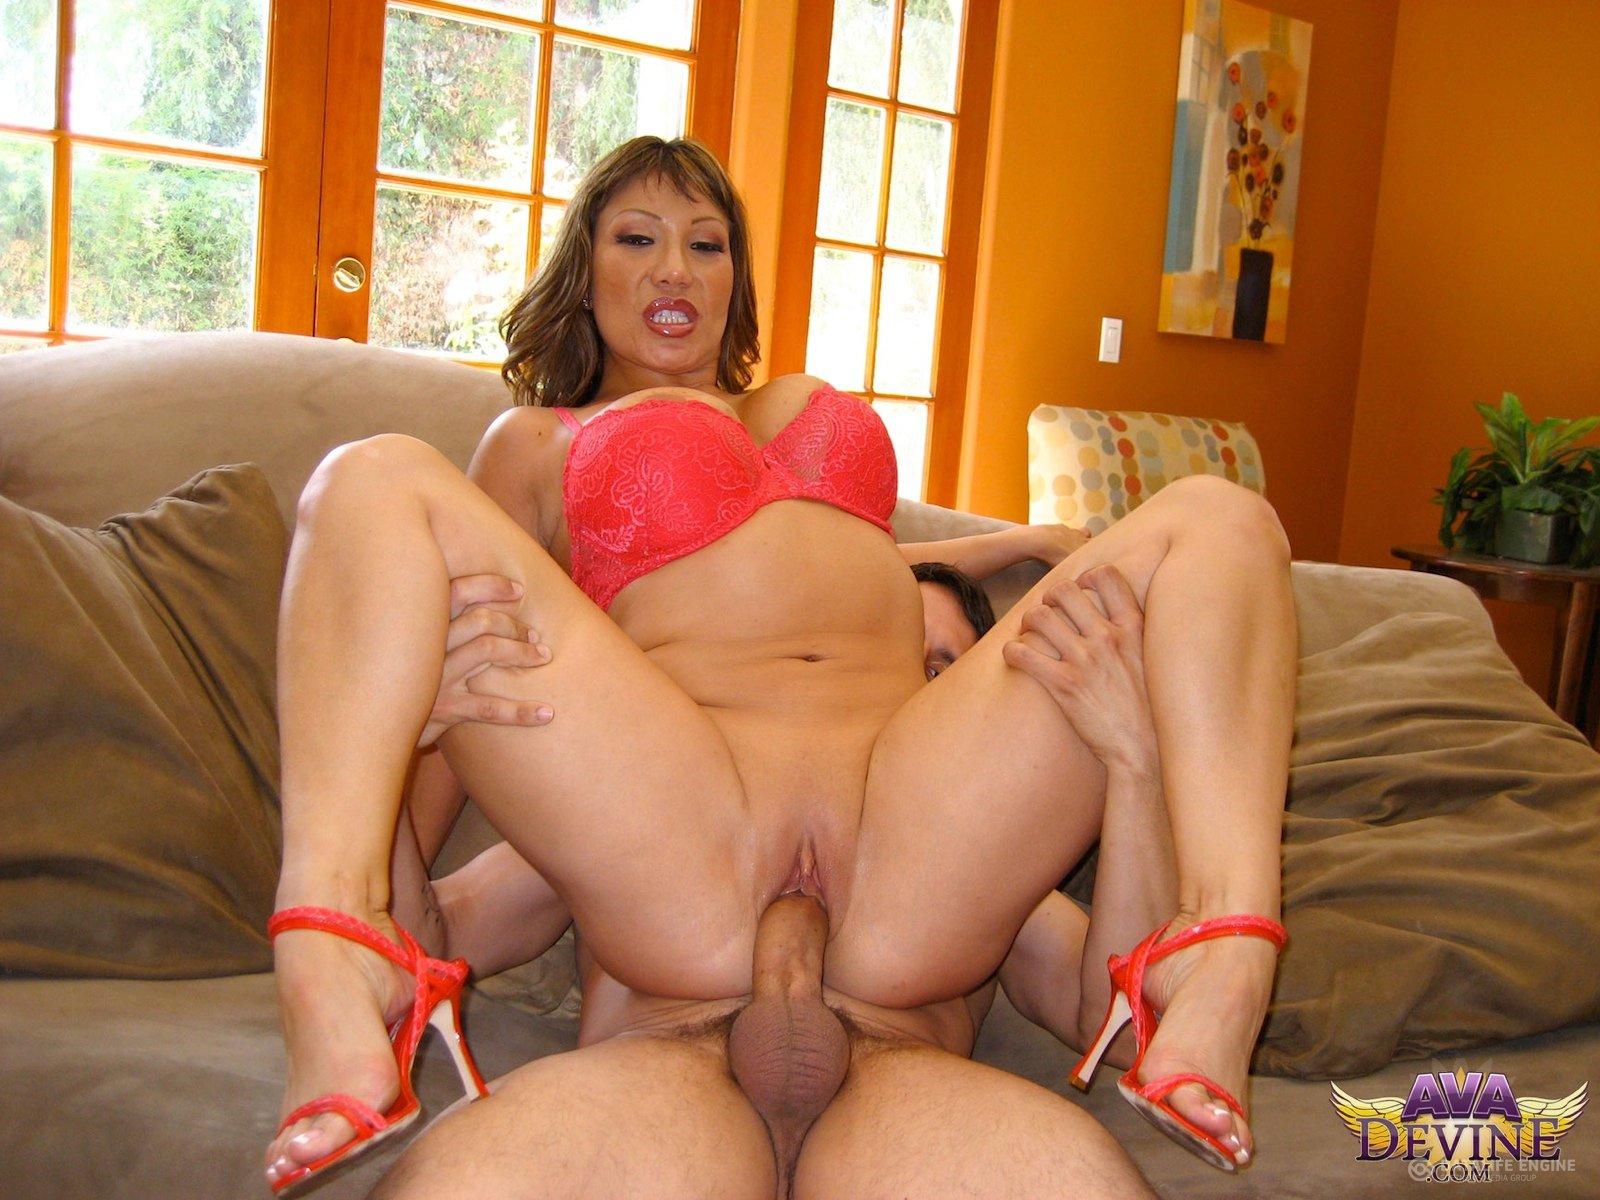 Супер секси мама для сына, Секс с мамой » Порно мамочки онлайн Full HD 2 фотография